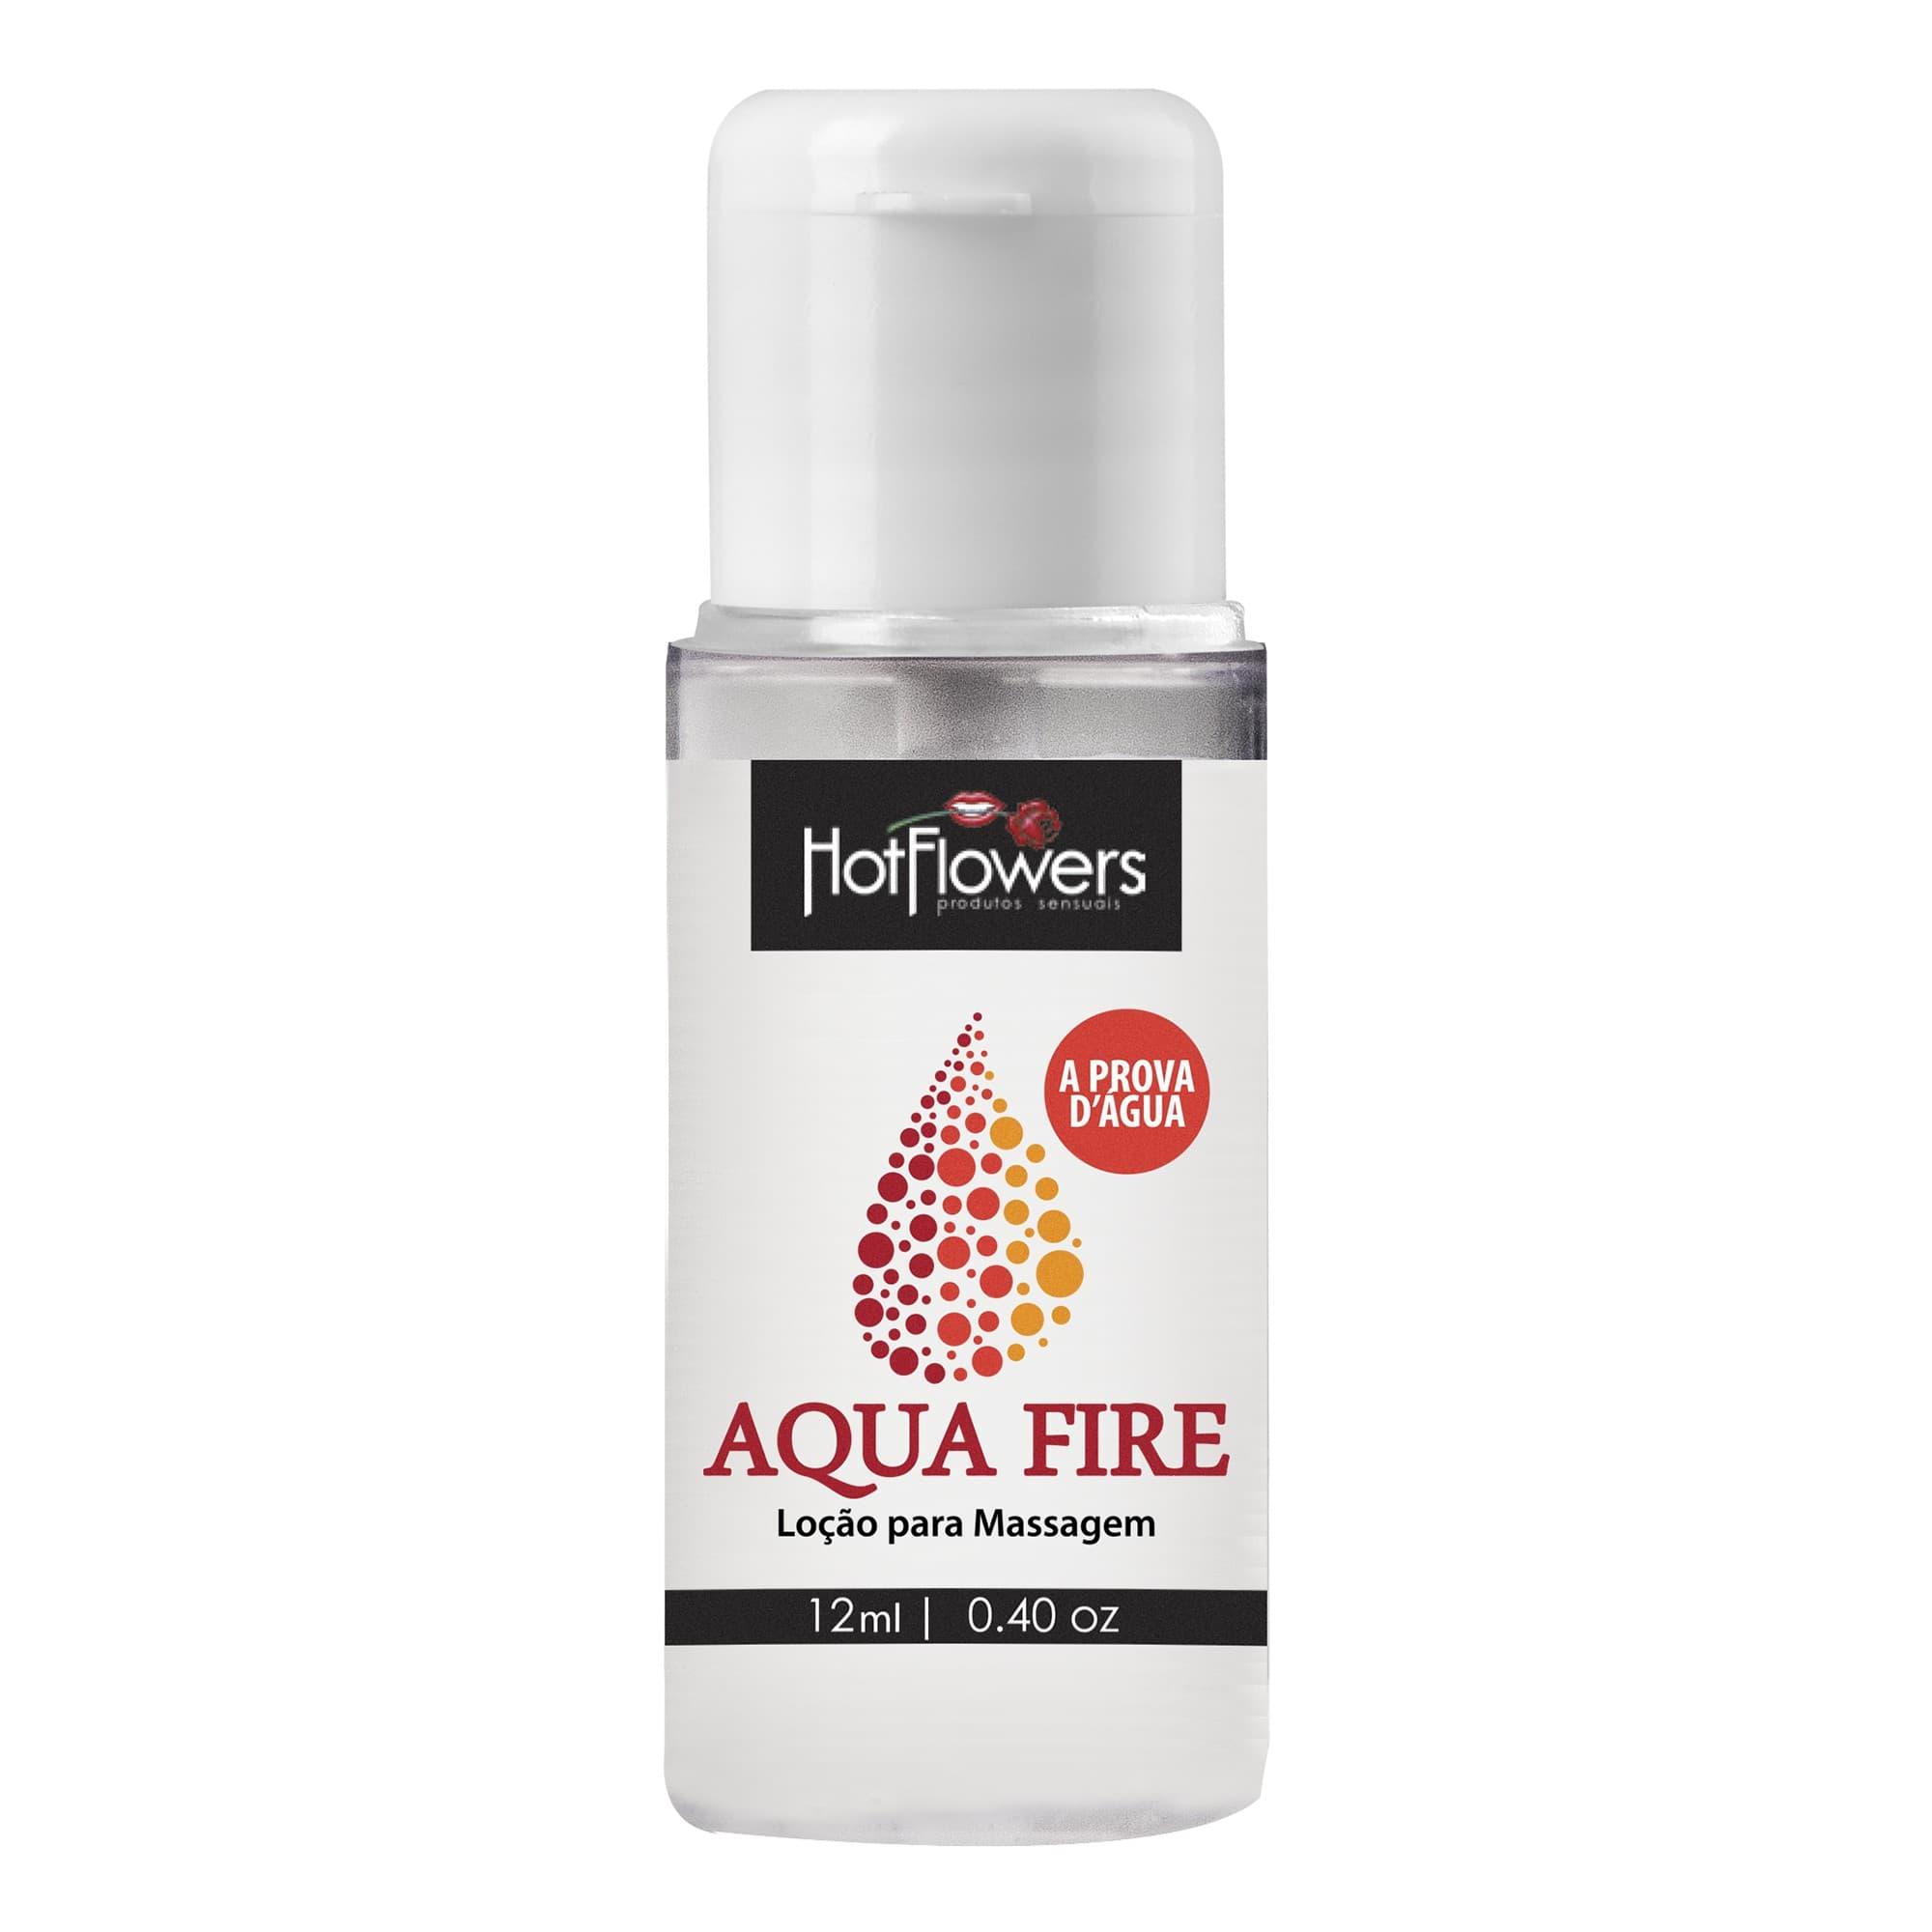 Lubrificante Aqua Fire - À Prova d'Água - Hot Flowers